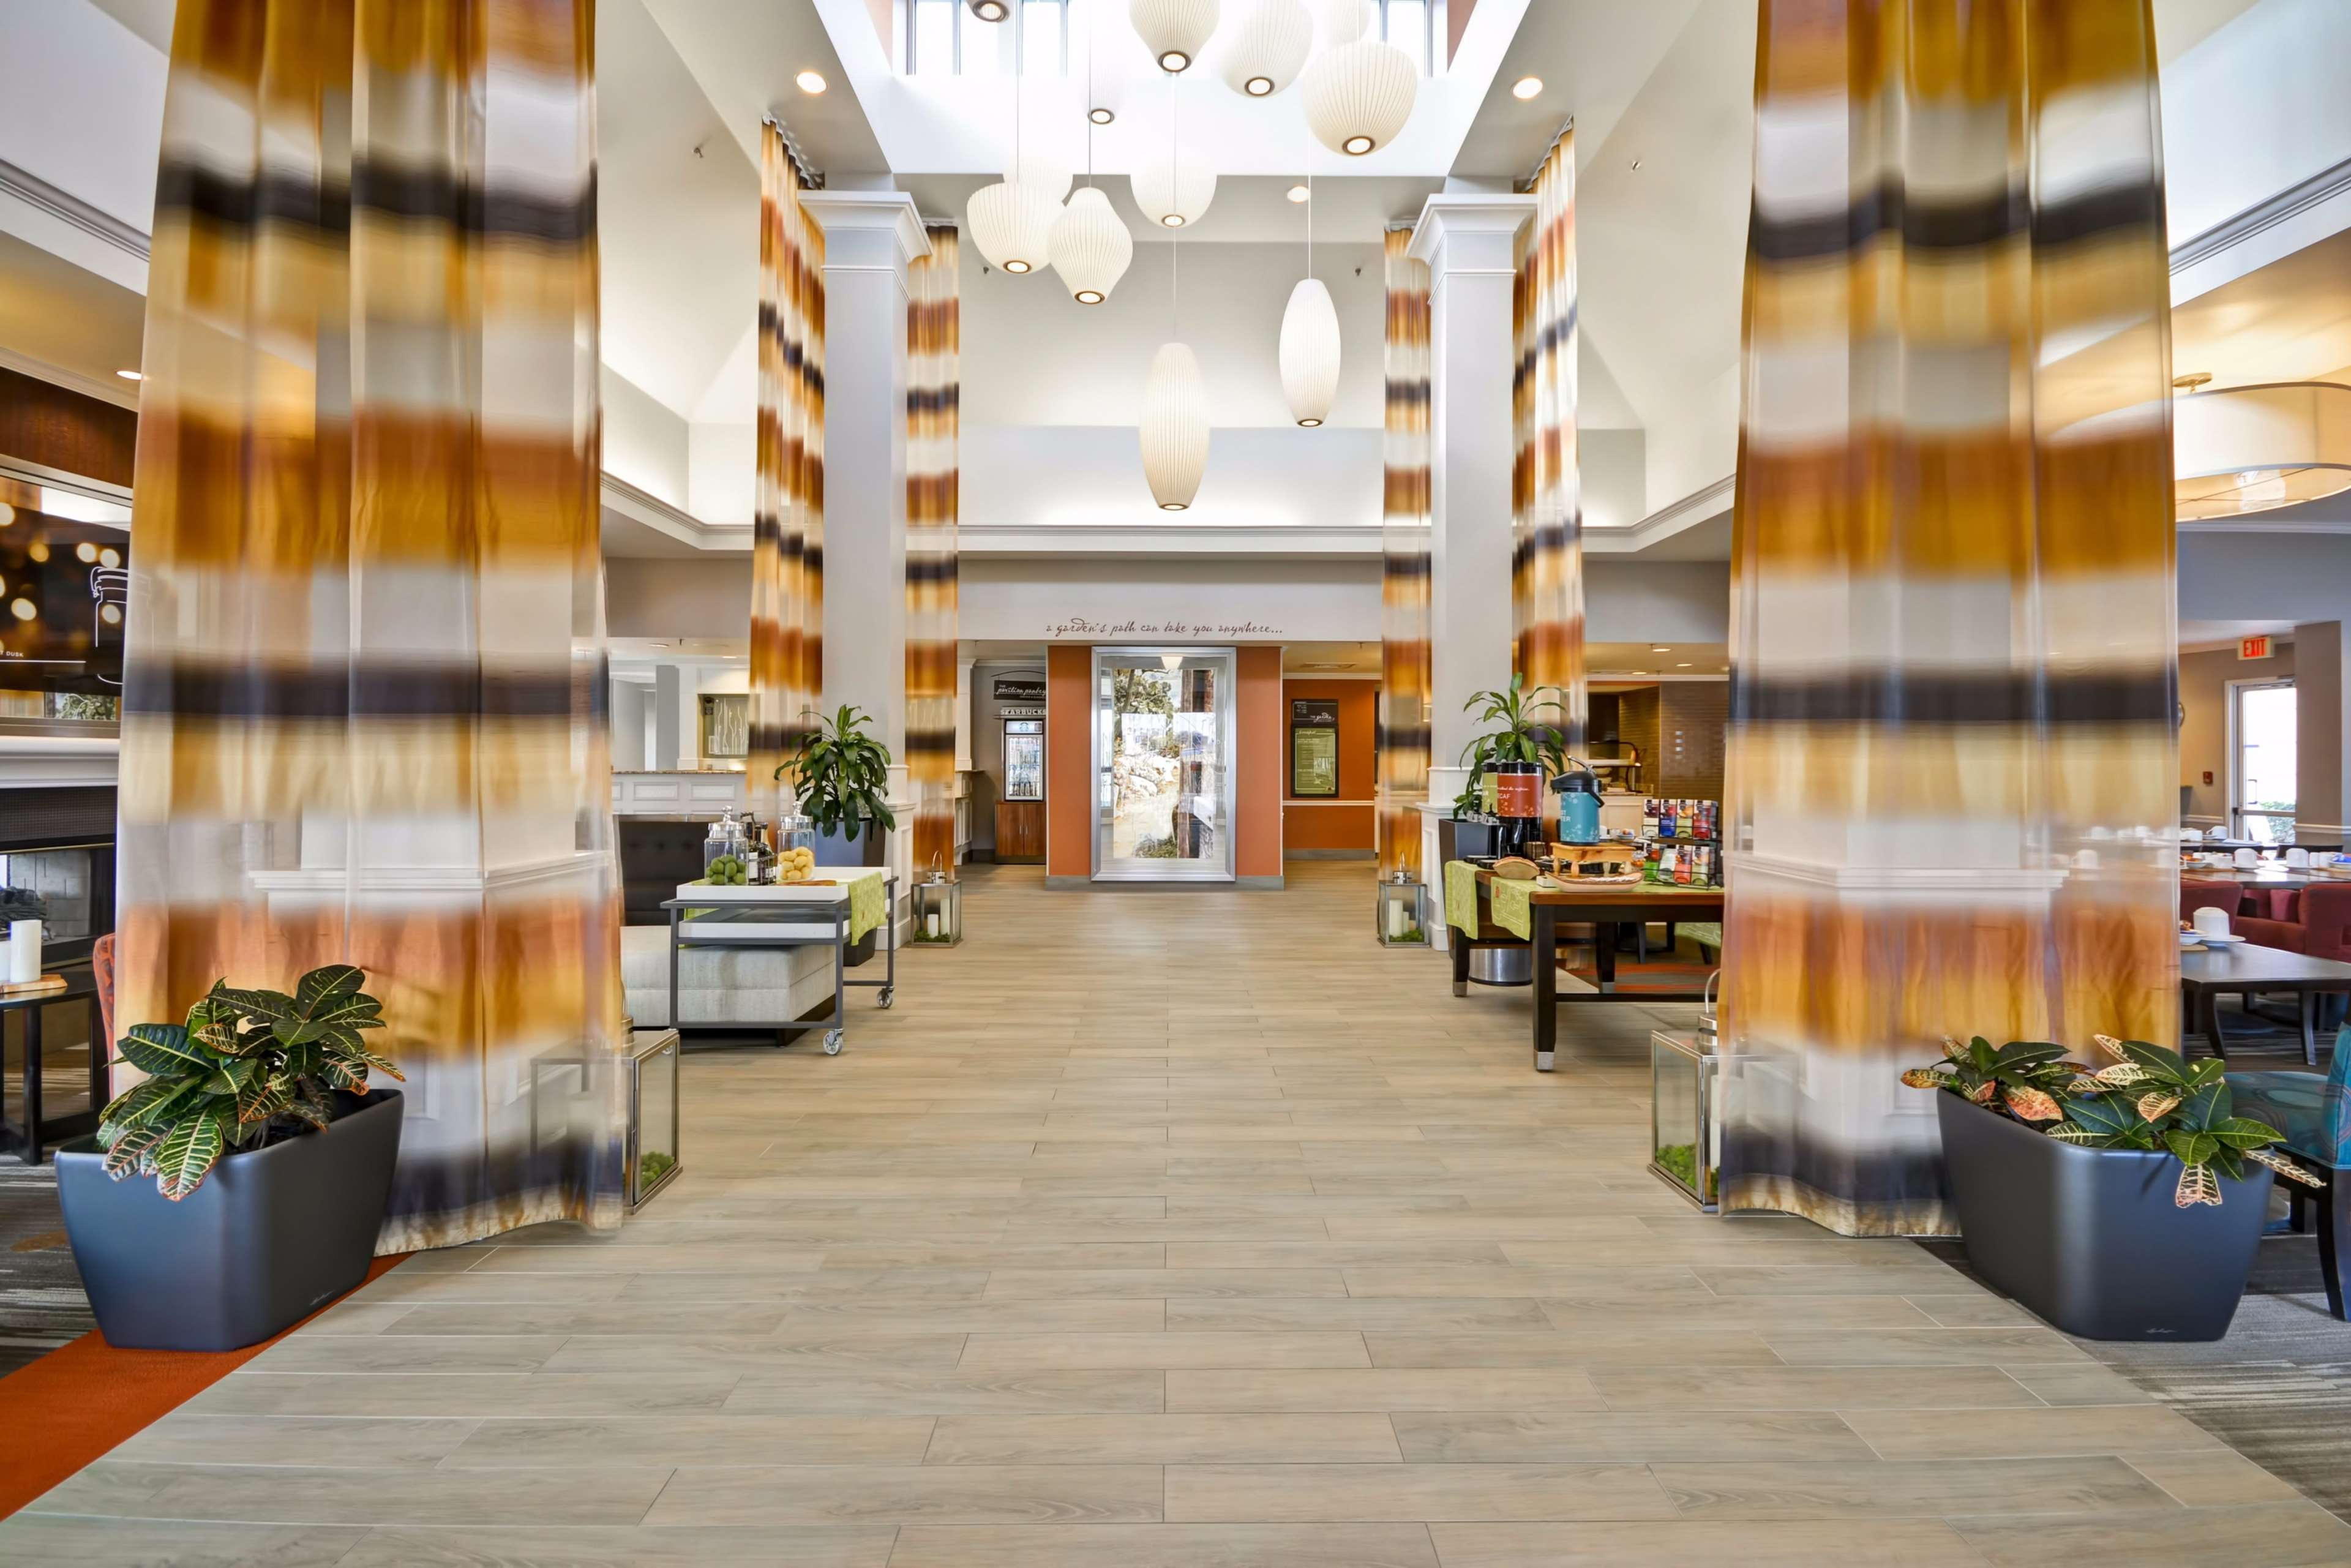 Hilton Garden Inn Austin/Round Rock image 2